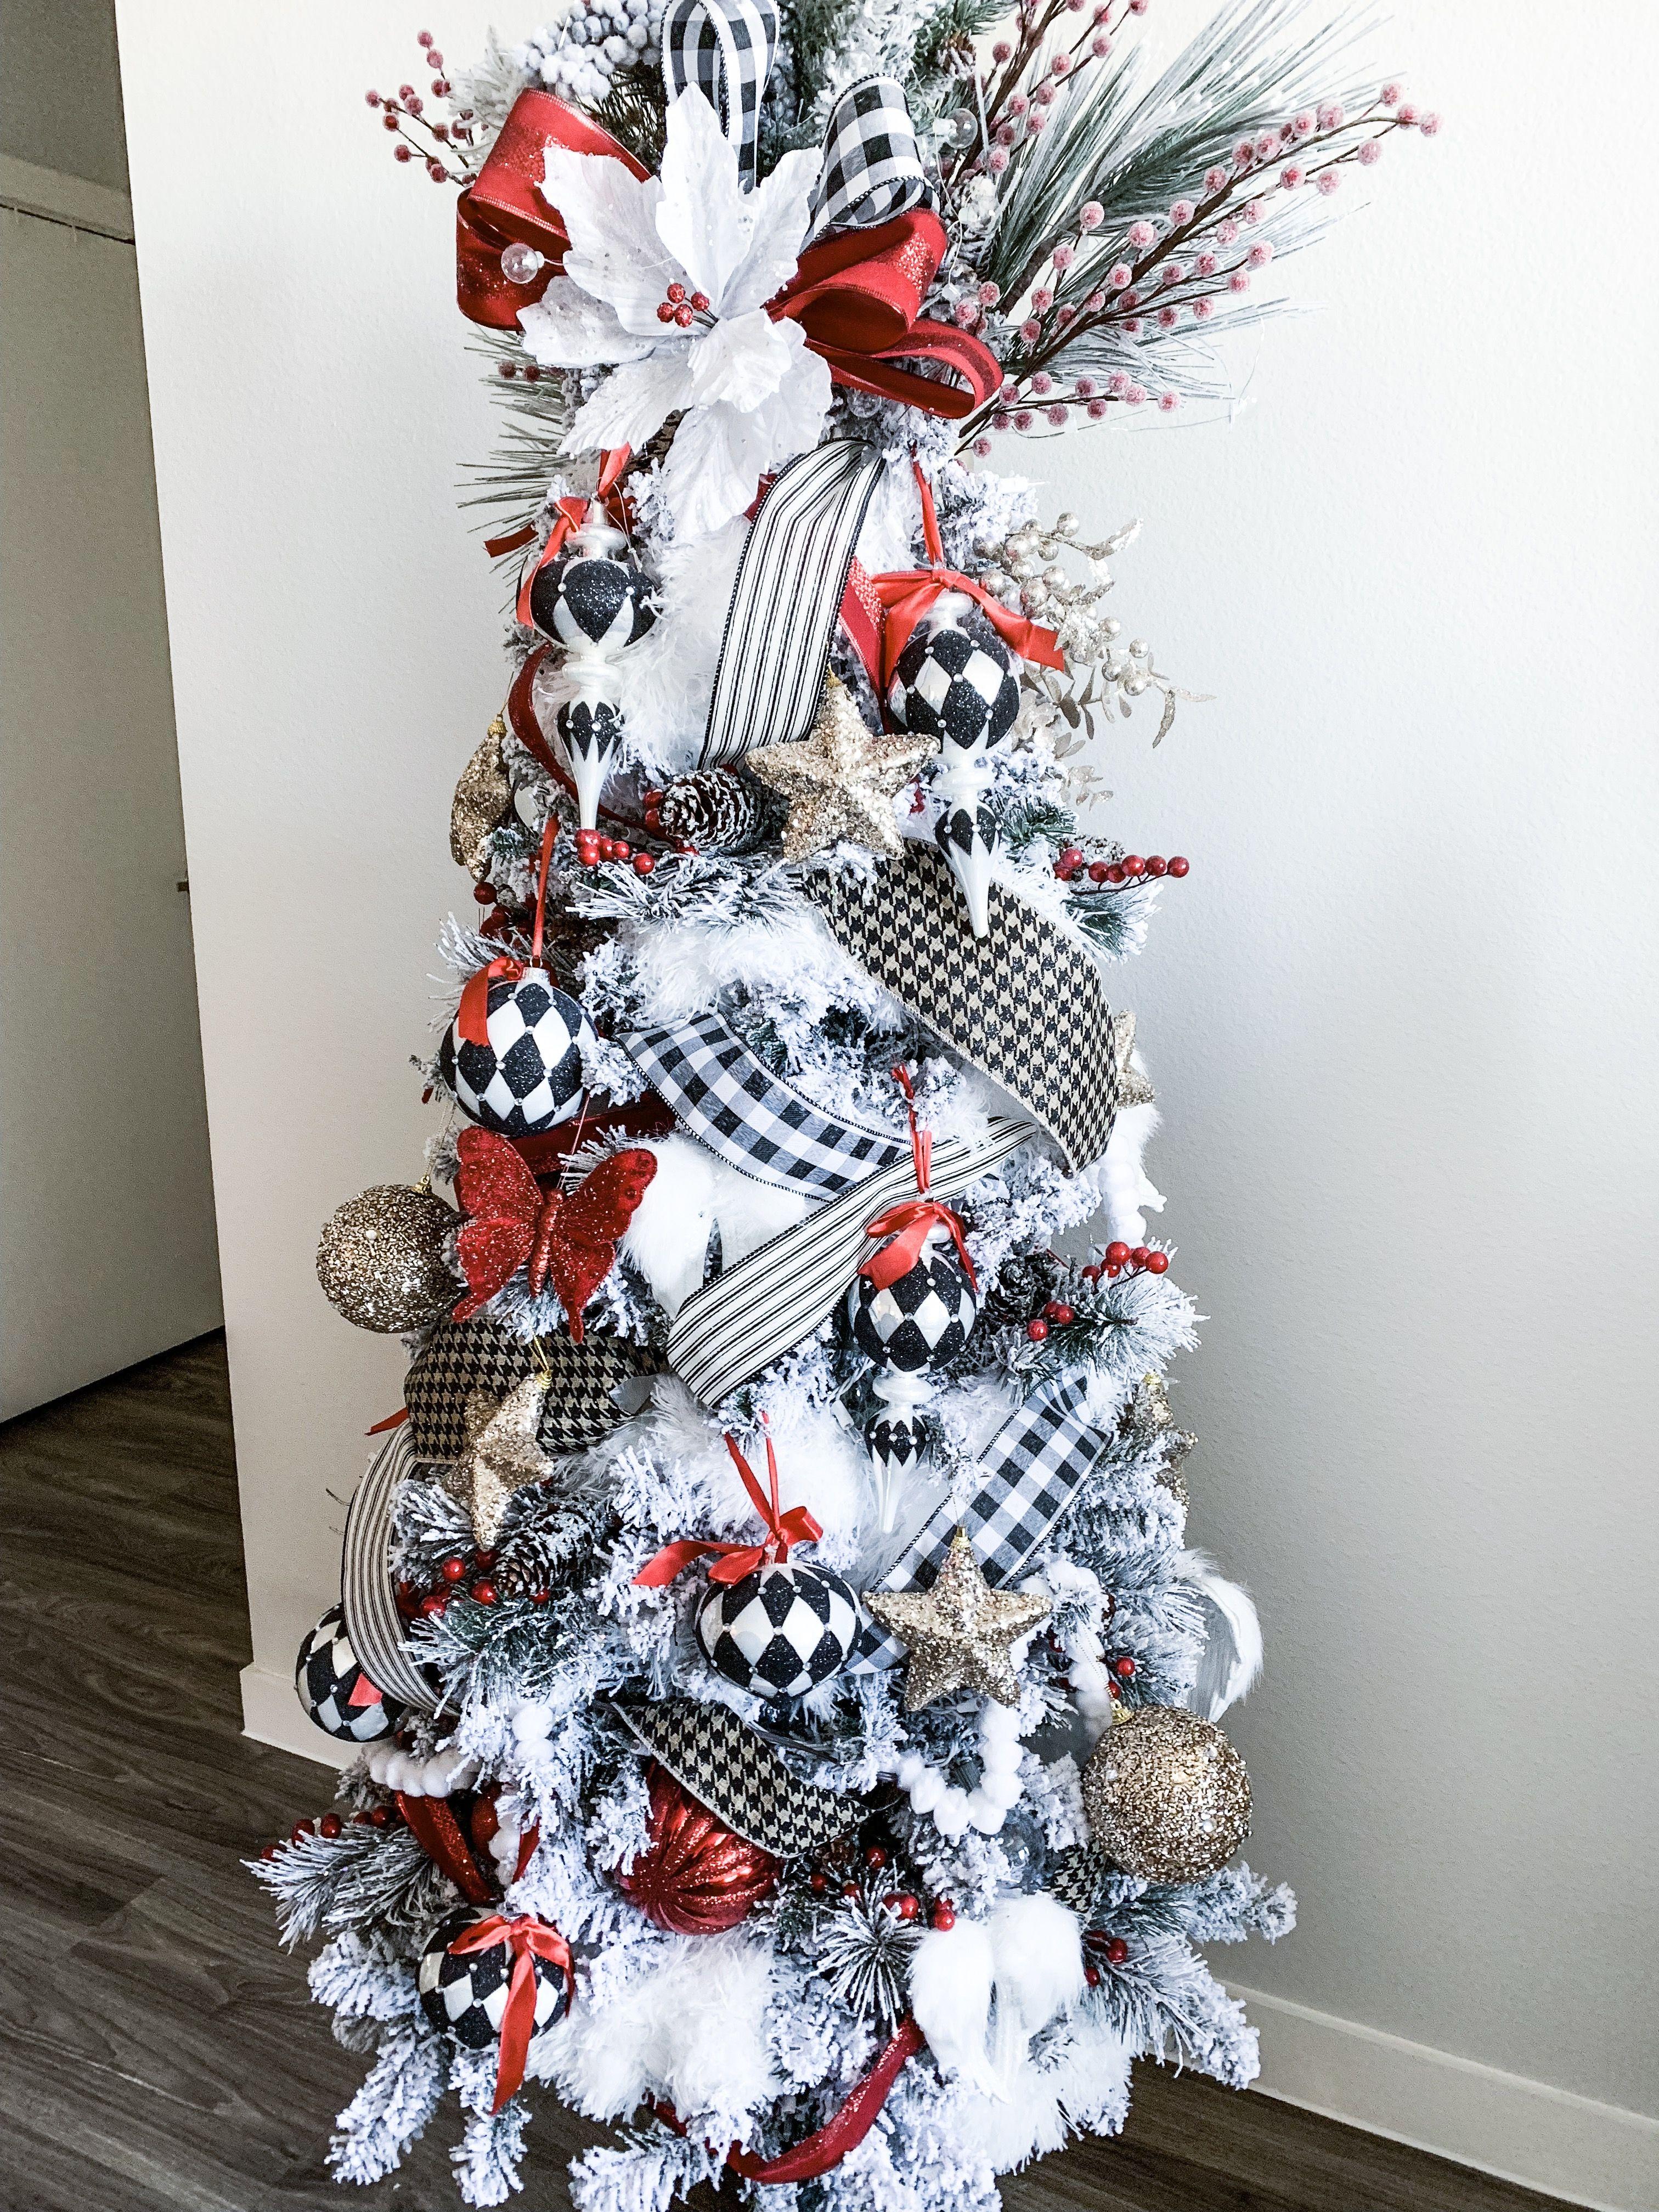 Black And White Christmas Tree Flocked Christmas Tree Red And Champagne Accents White Christmas Tree Decorations Red Christmas Decor White Christmas Trees